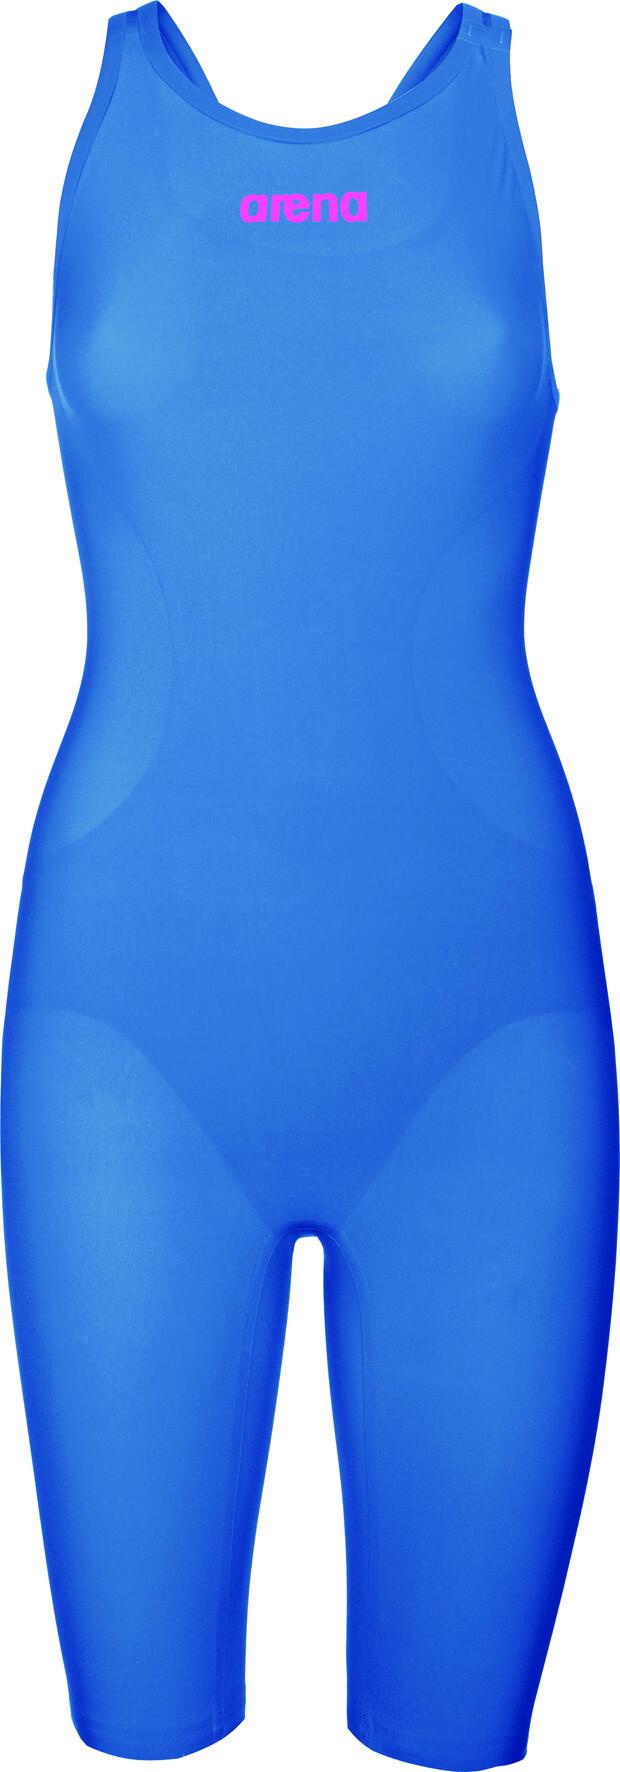 bf8320c2 arena Powerskin R-Evo One Badedrakt Dame blue/powder pink | Gode ...